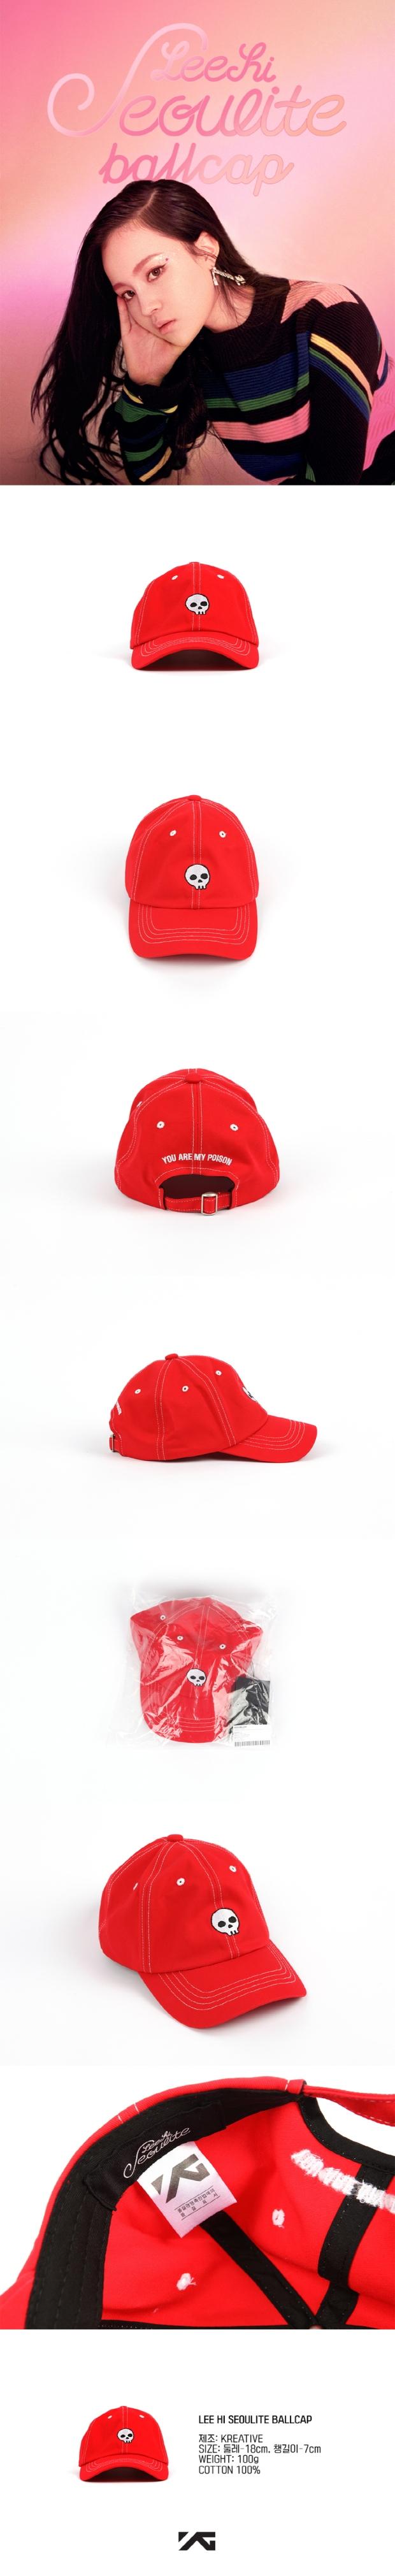 01_leehi-ballcap_01